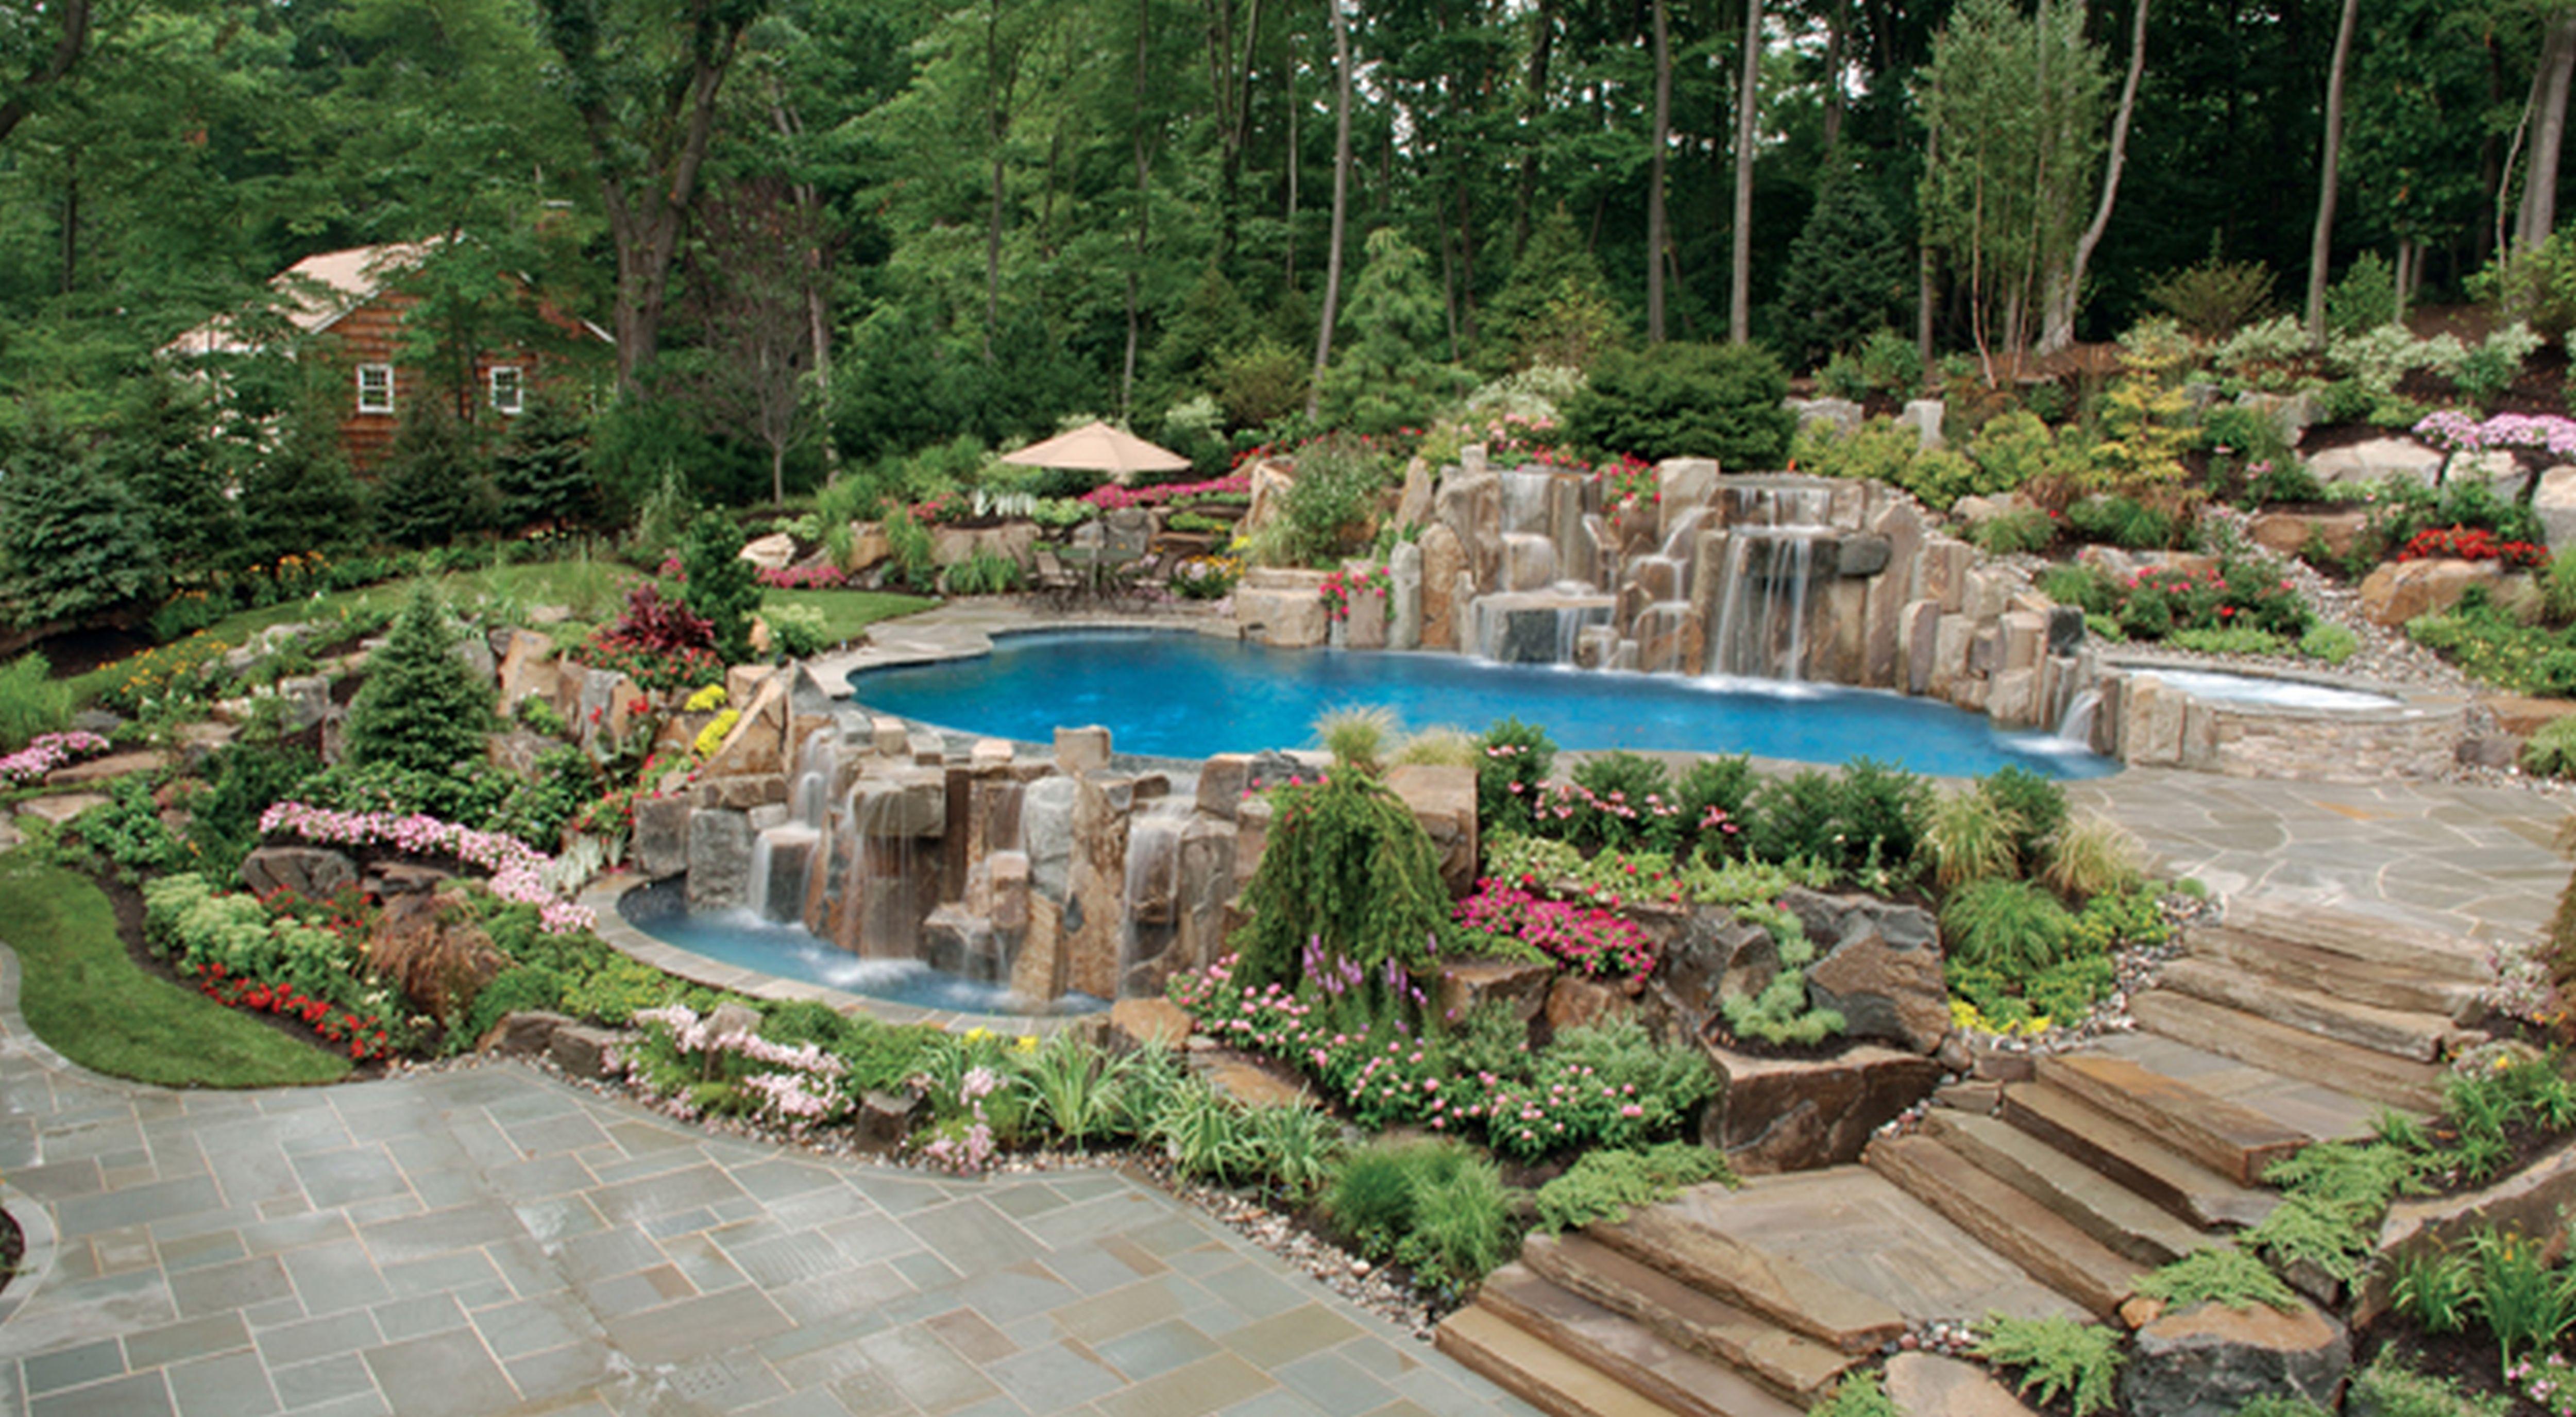 delightful backyard garden ideas inside likable best backyard backyard landscaping bridges